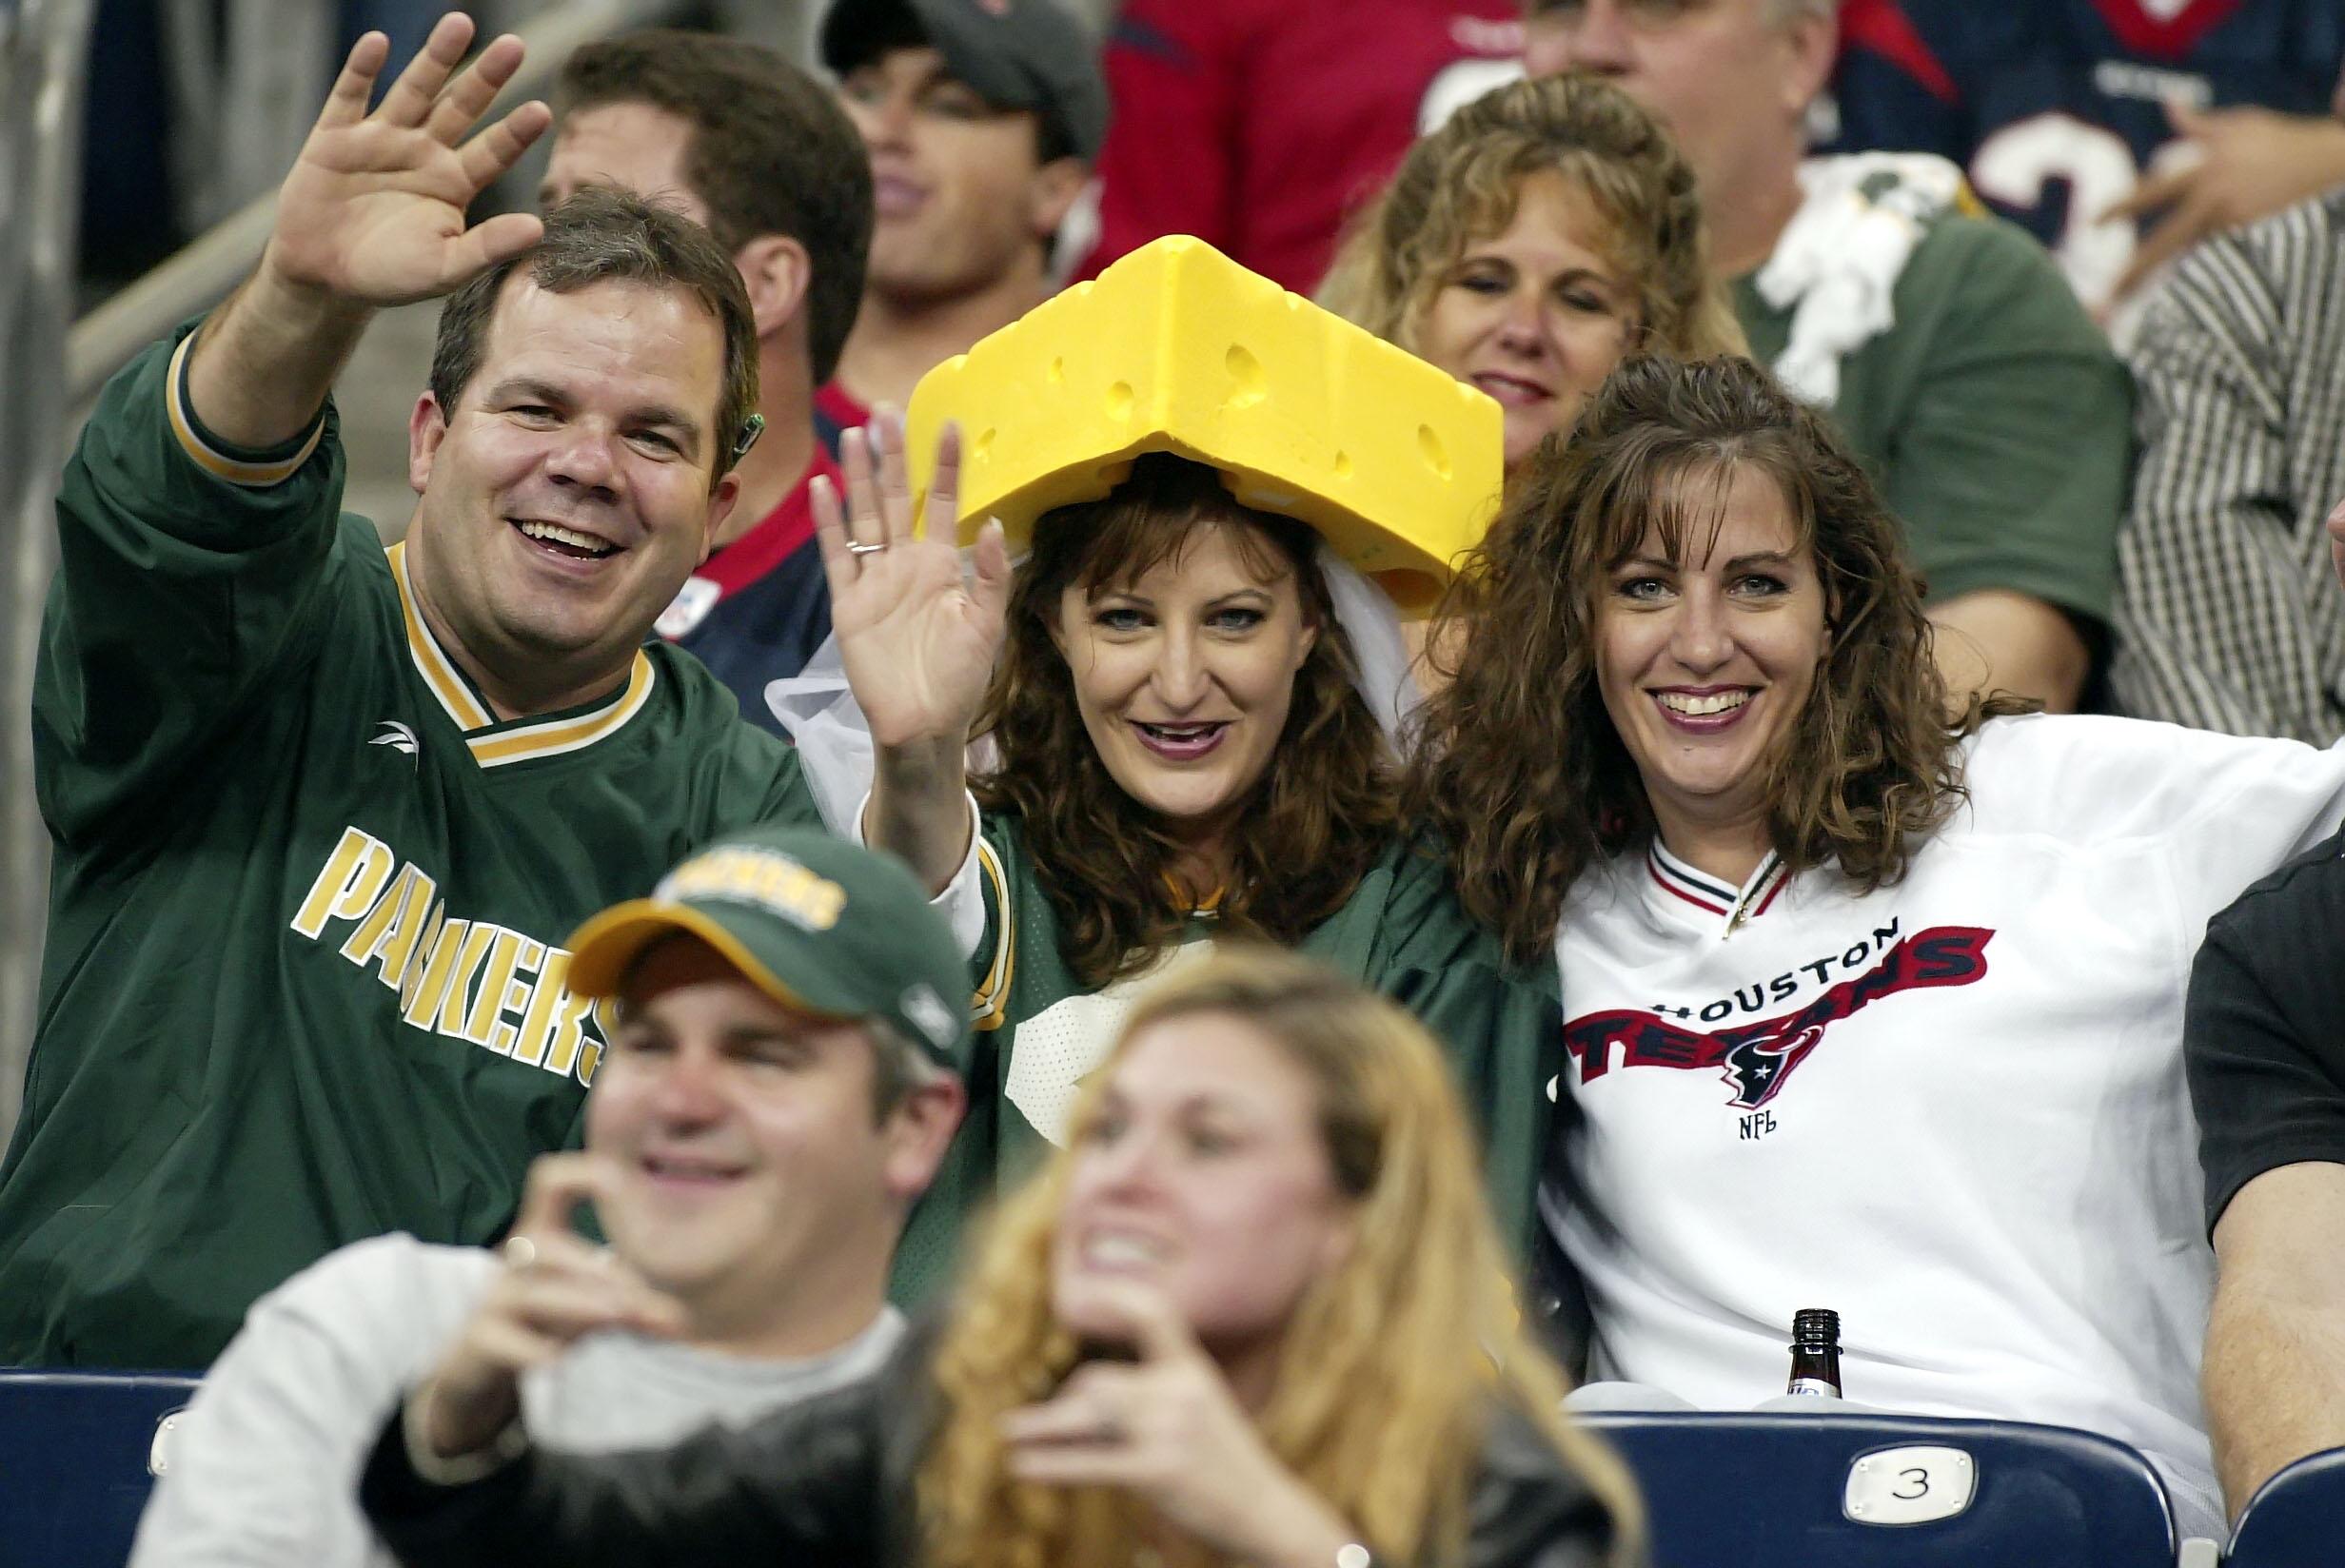 NFL Football 2004 - Packers vs. Texans